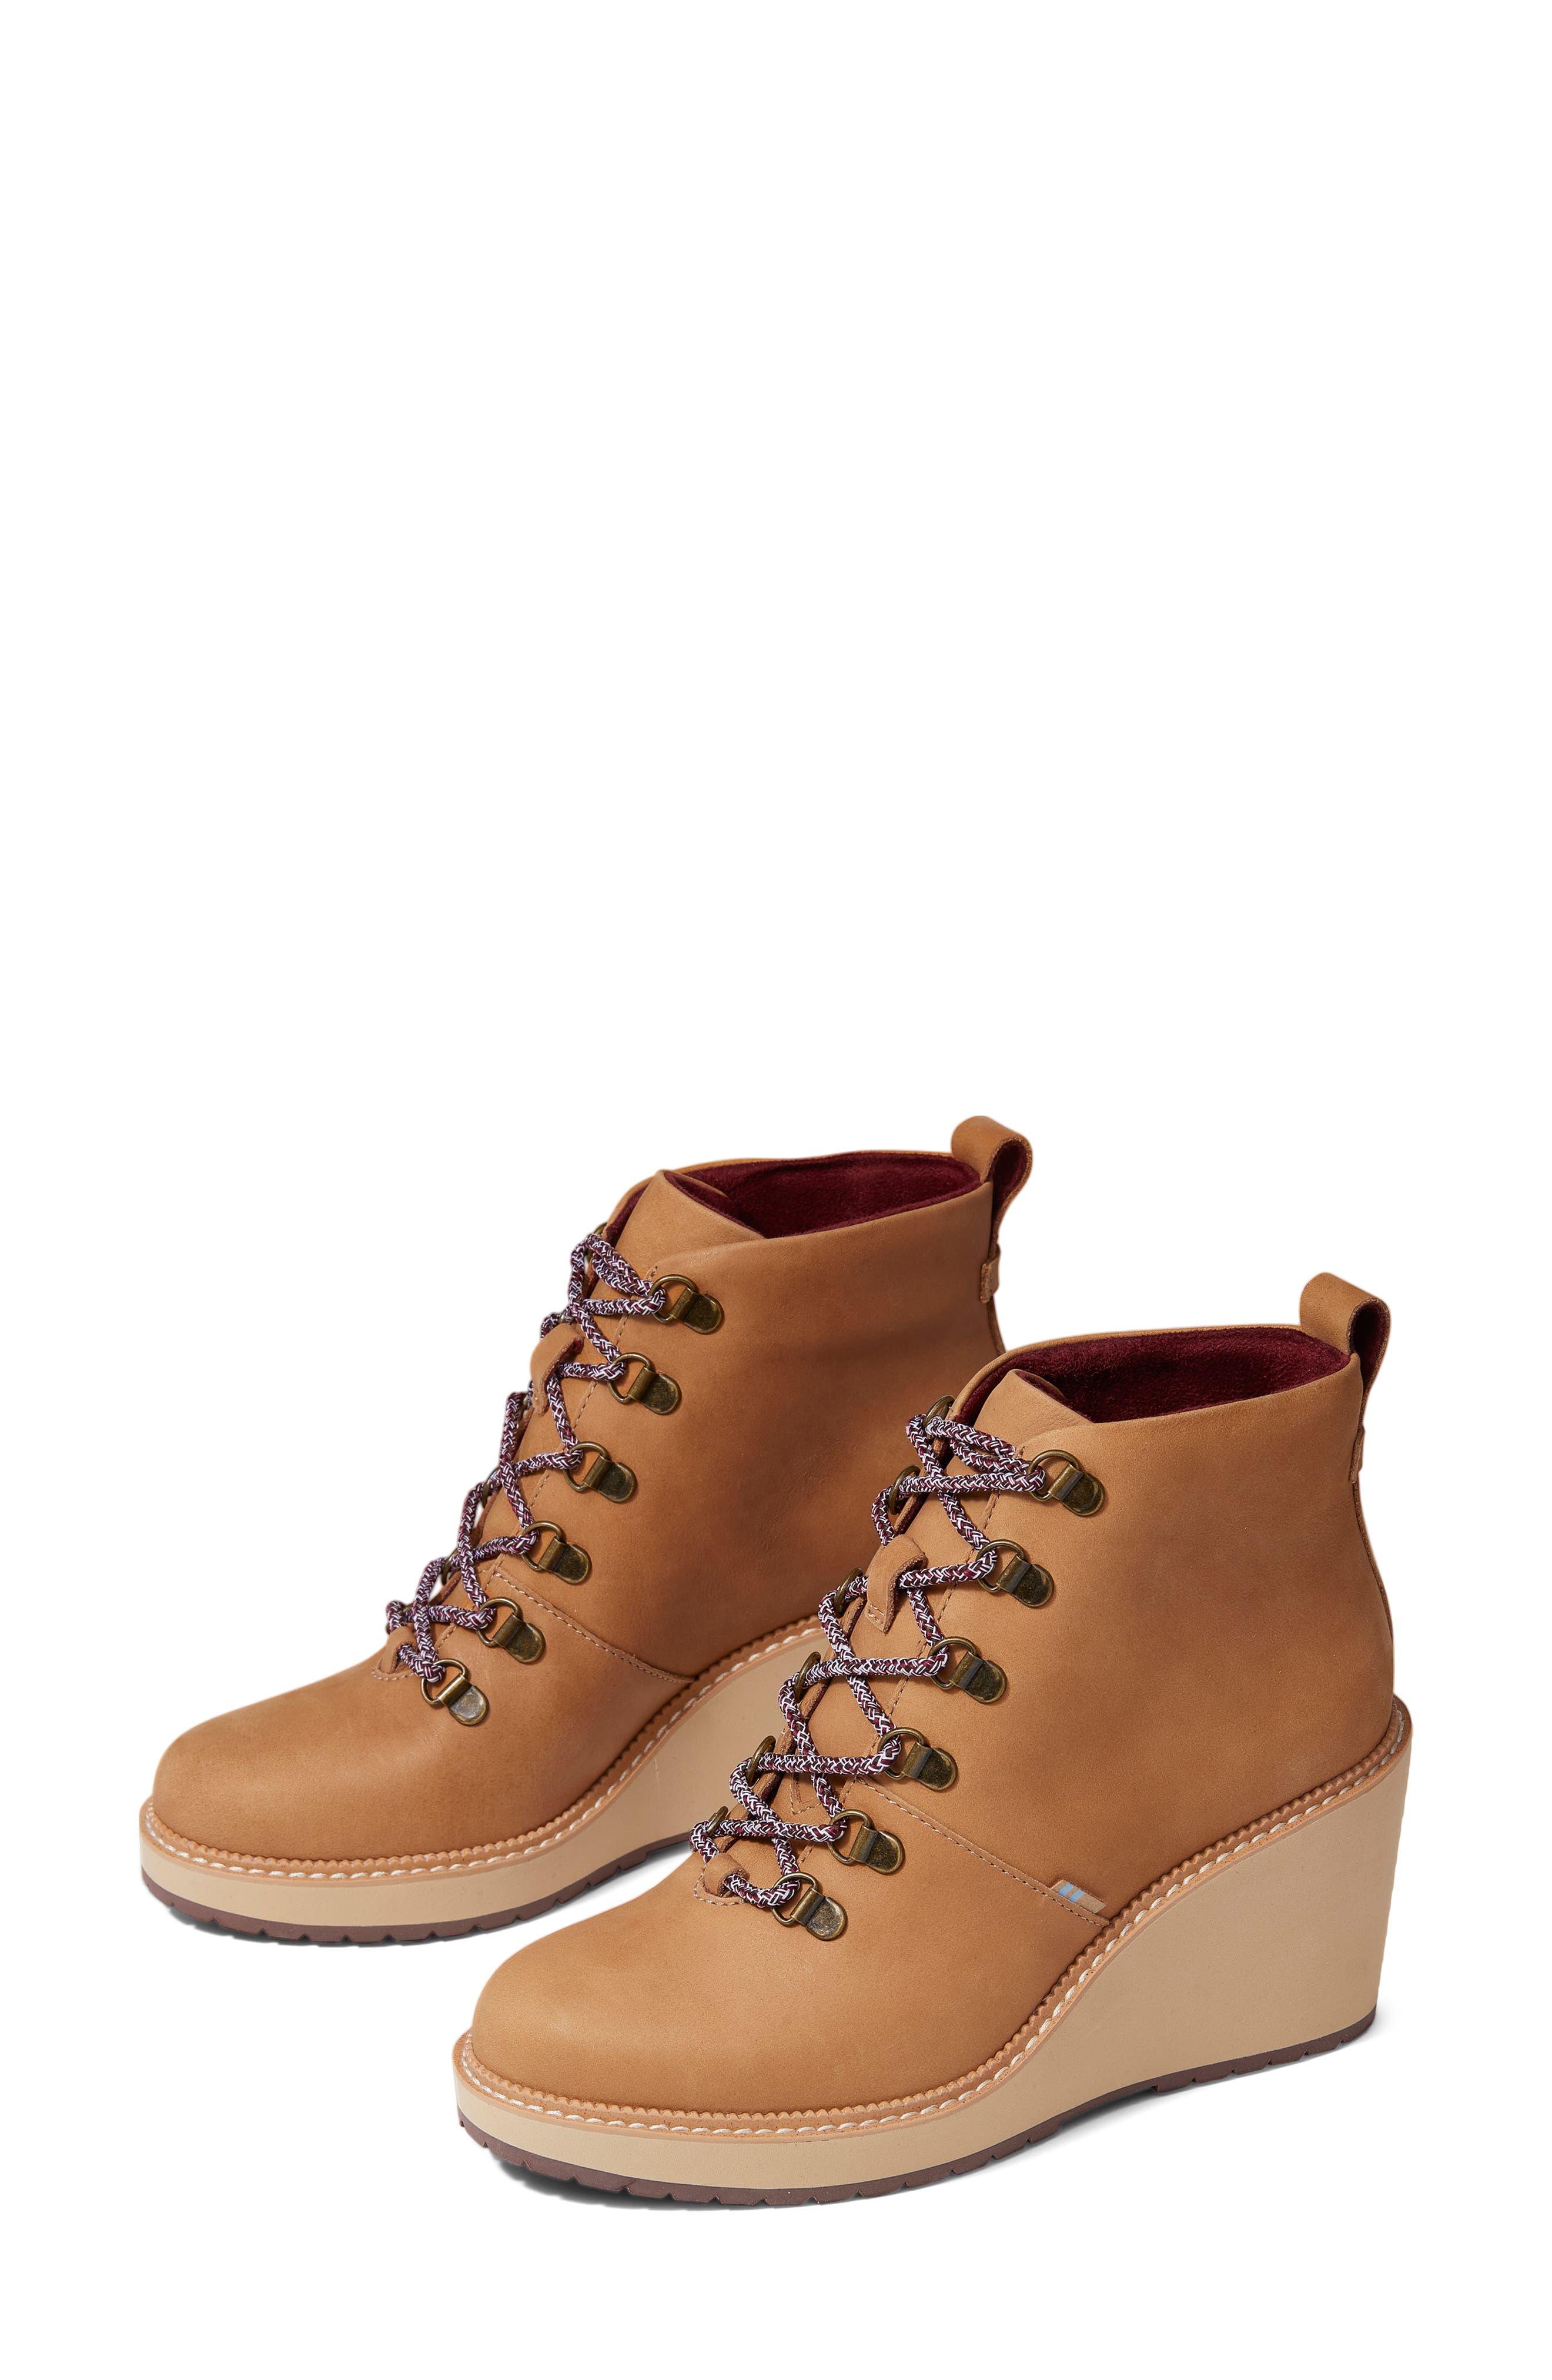 Women's Wedge Booties \u0026 Ankle Boots